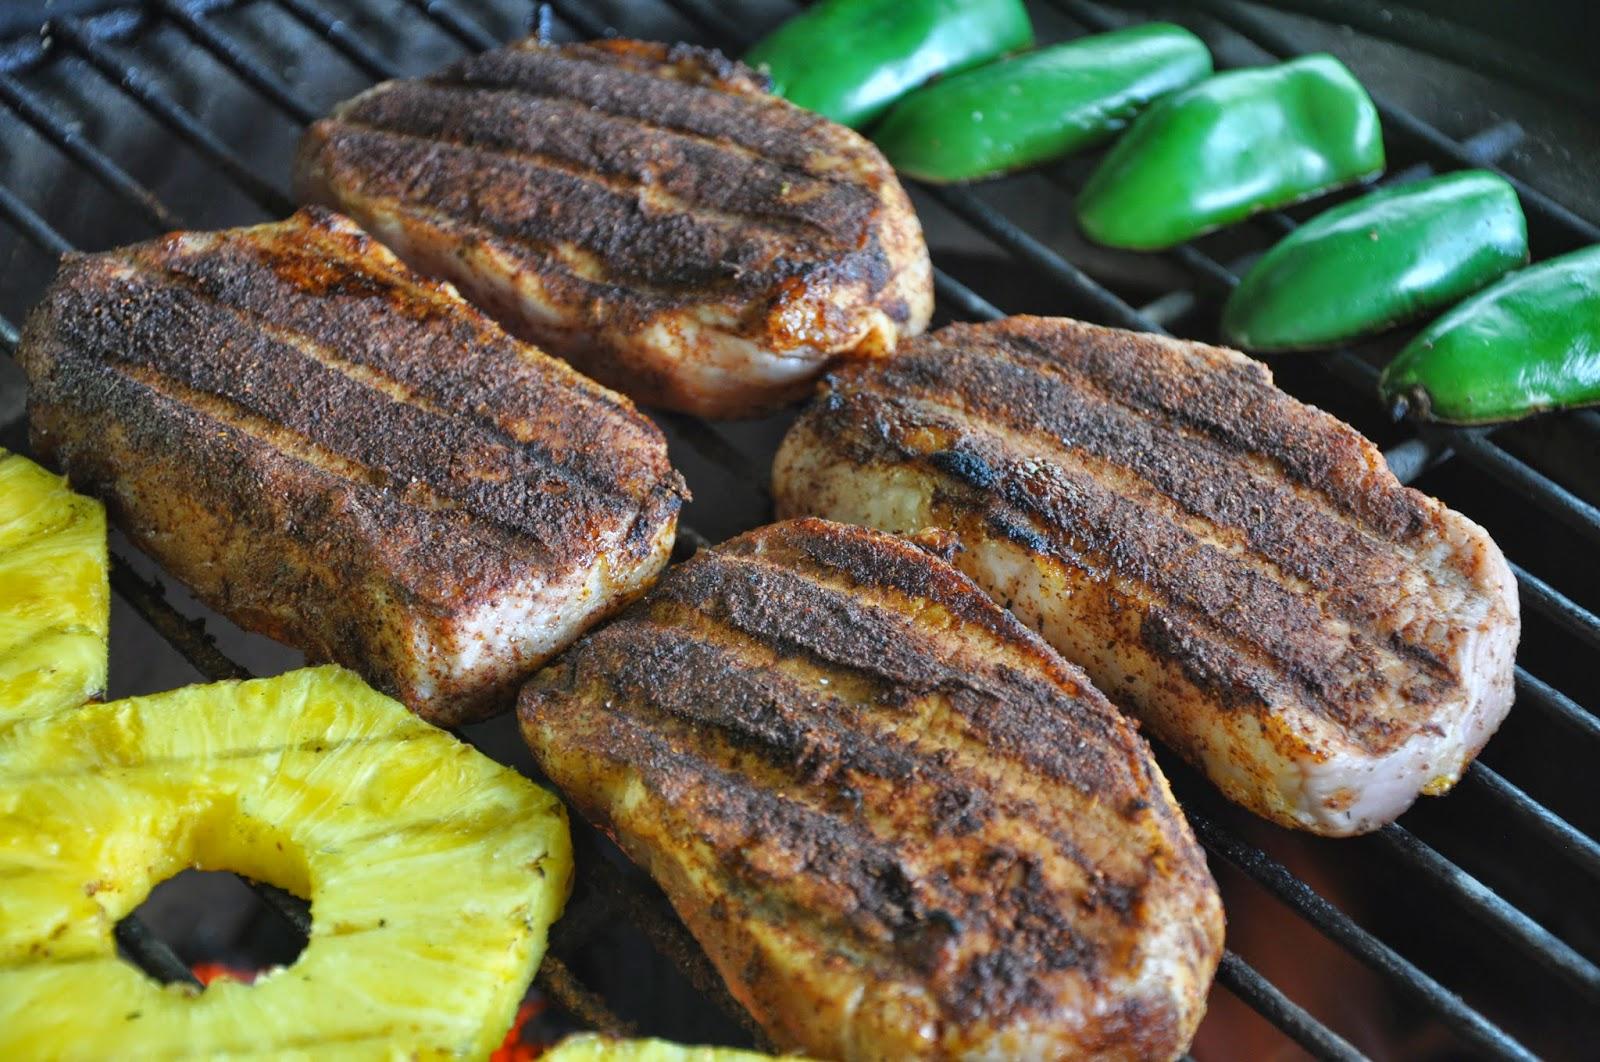 Big T's Big Green Egg Recipe Blog: Father's Day Chili Rubbed Pork ...